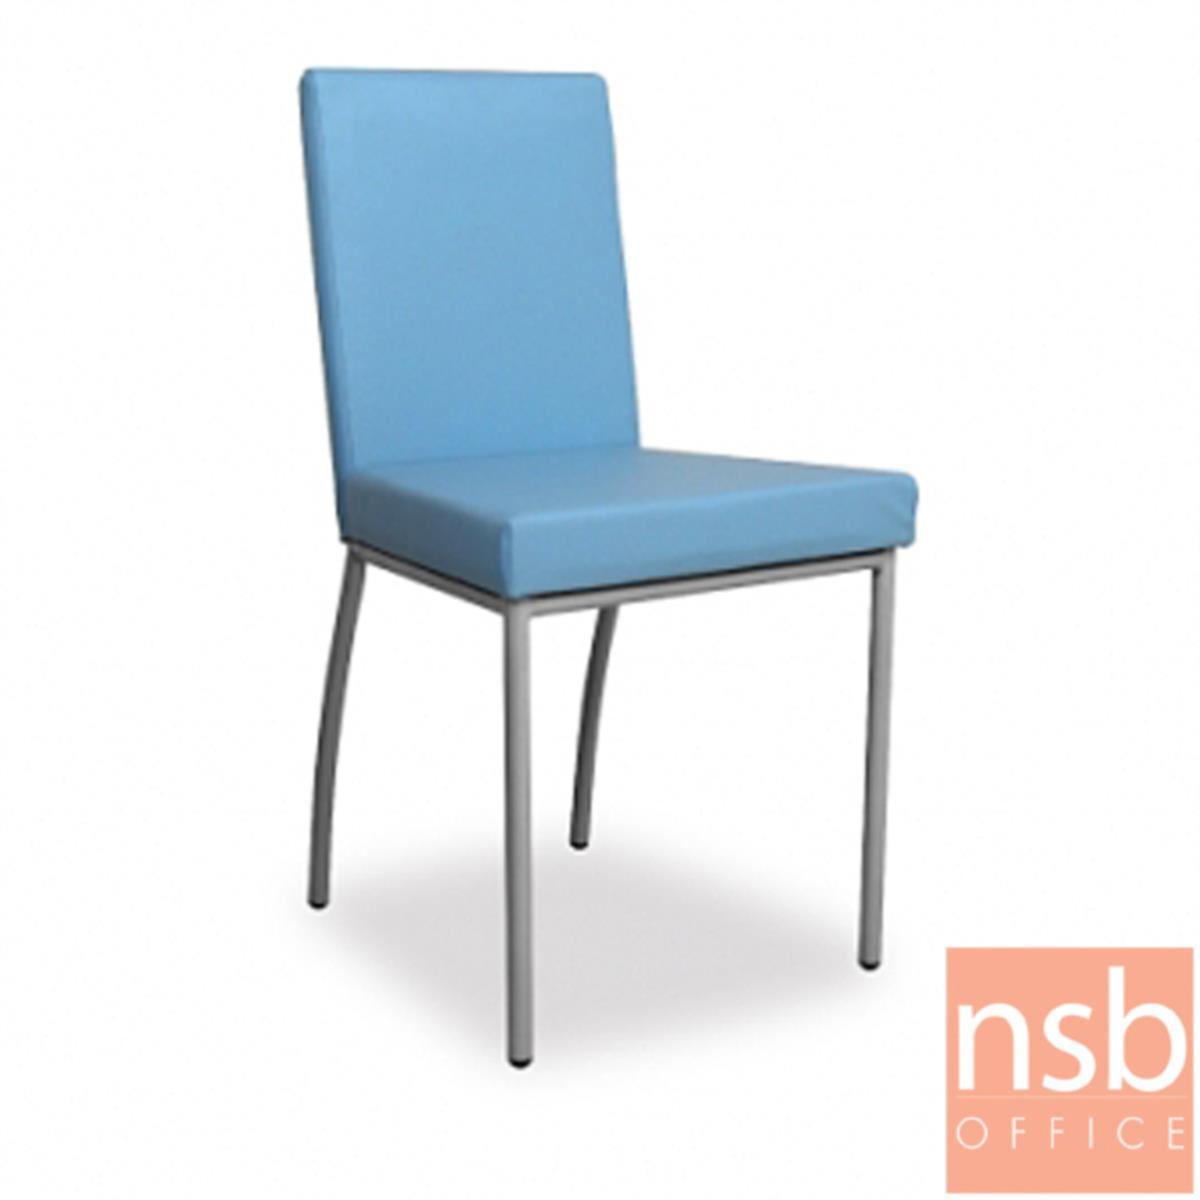 B20A096:เก้าอี้อเนกประสงค์เหล็ก รุ่น GD-CI14  ขาเหล็กพ่นสีเทา